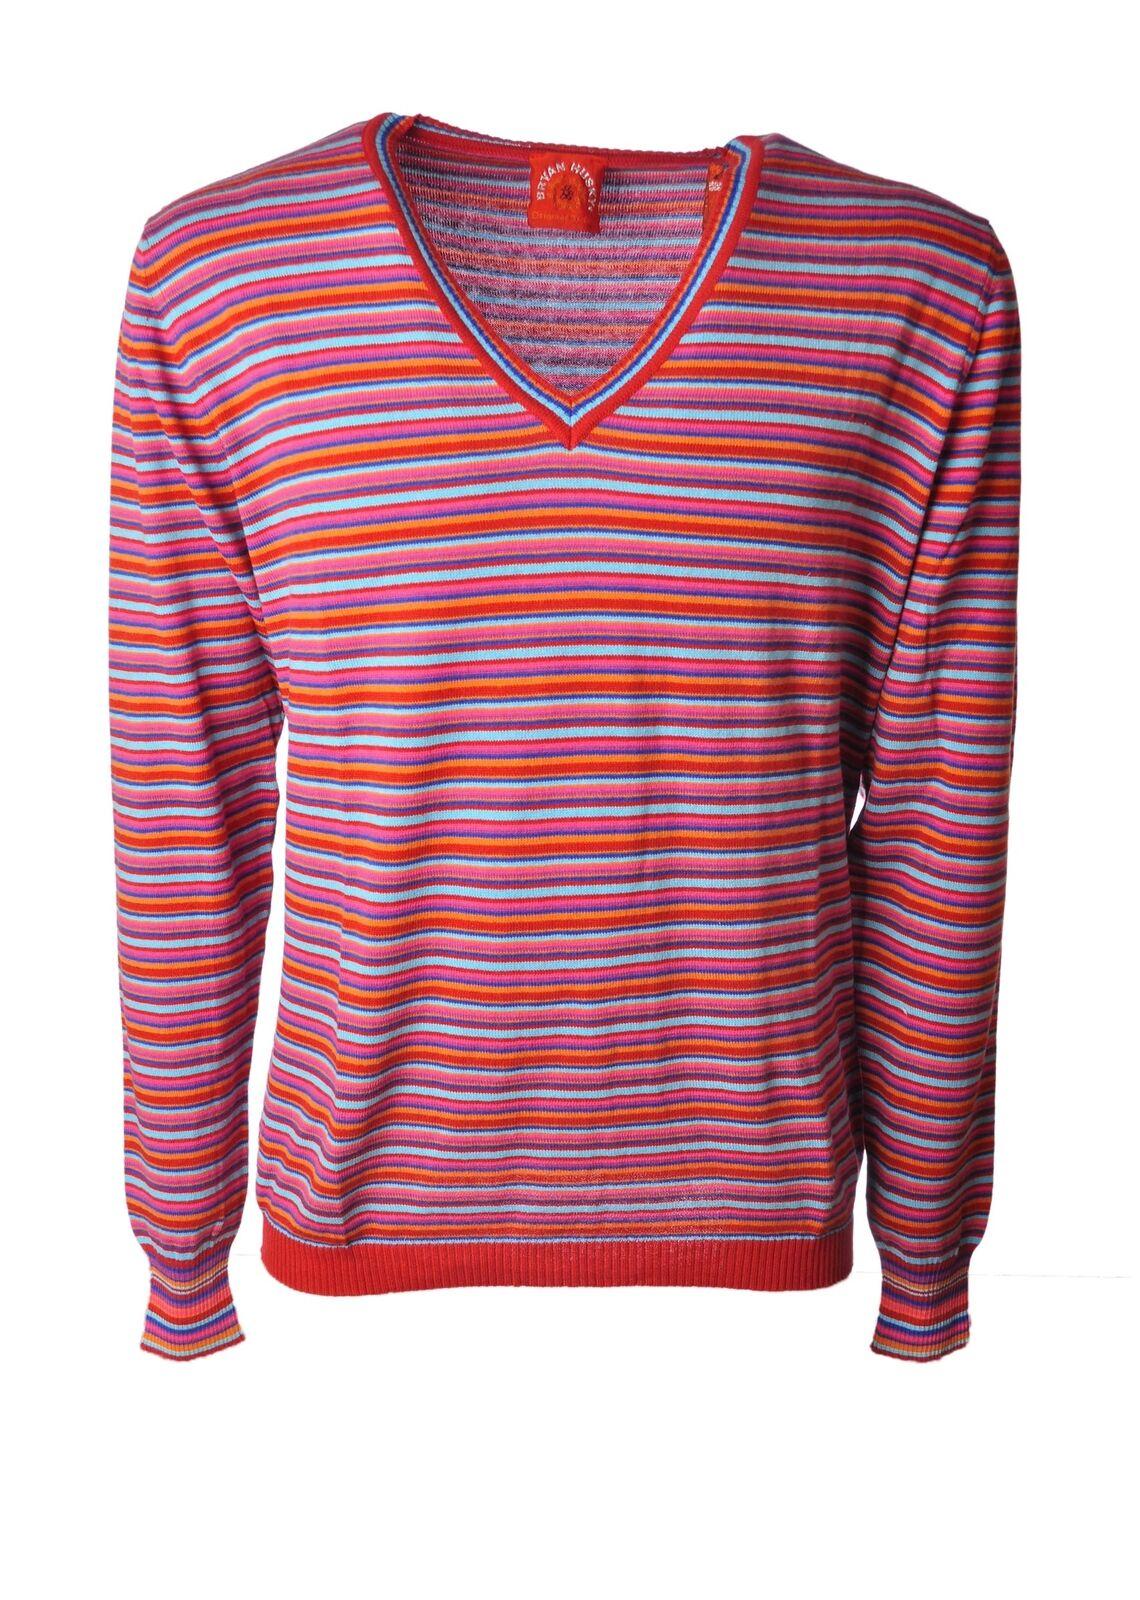 Bryan Husky  -  Sweaters - Male - Fantasy - 4512824A185404